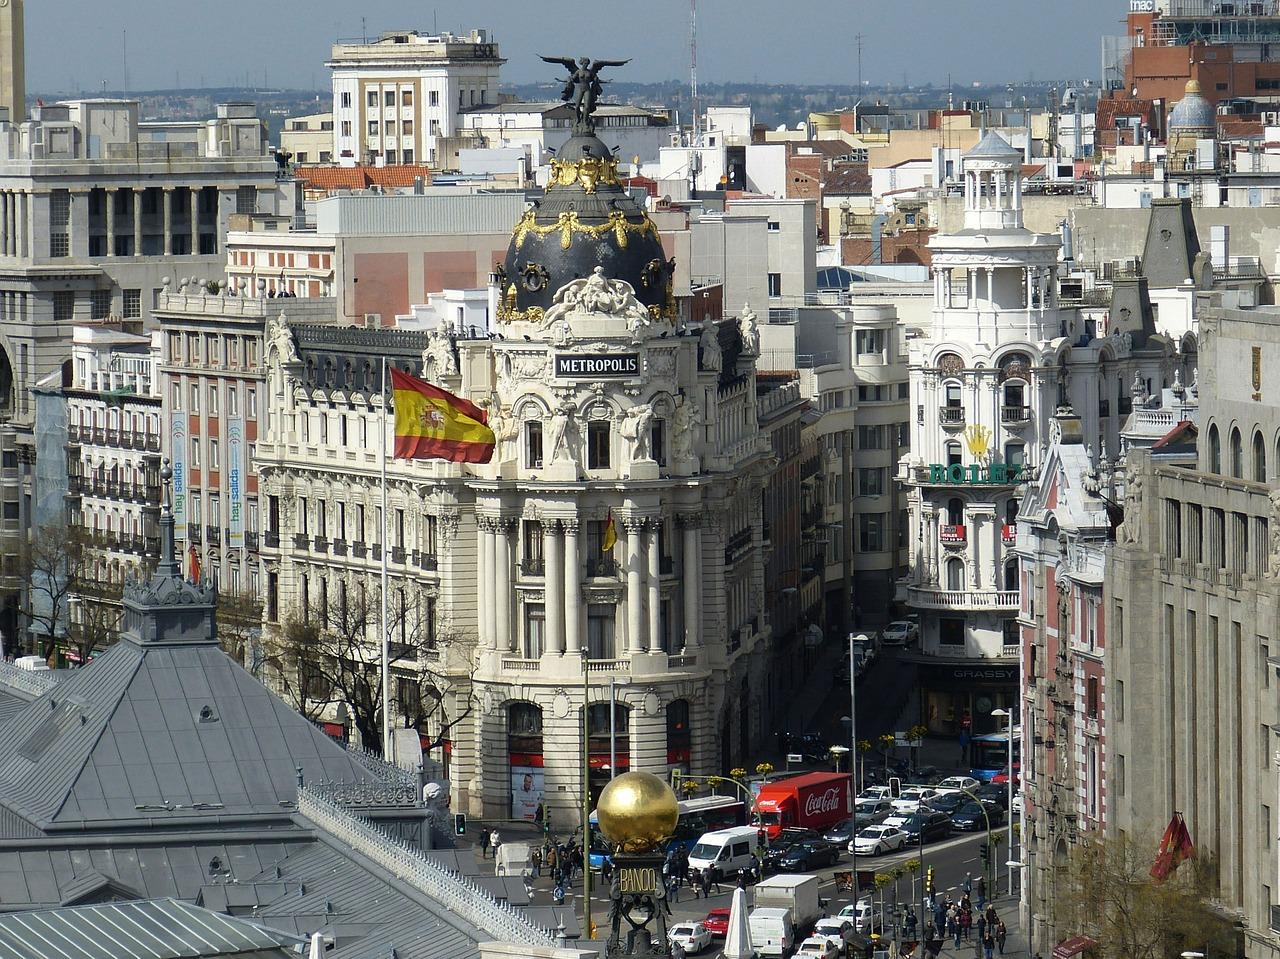 Madrid, Spain. Public domain image